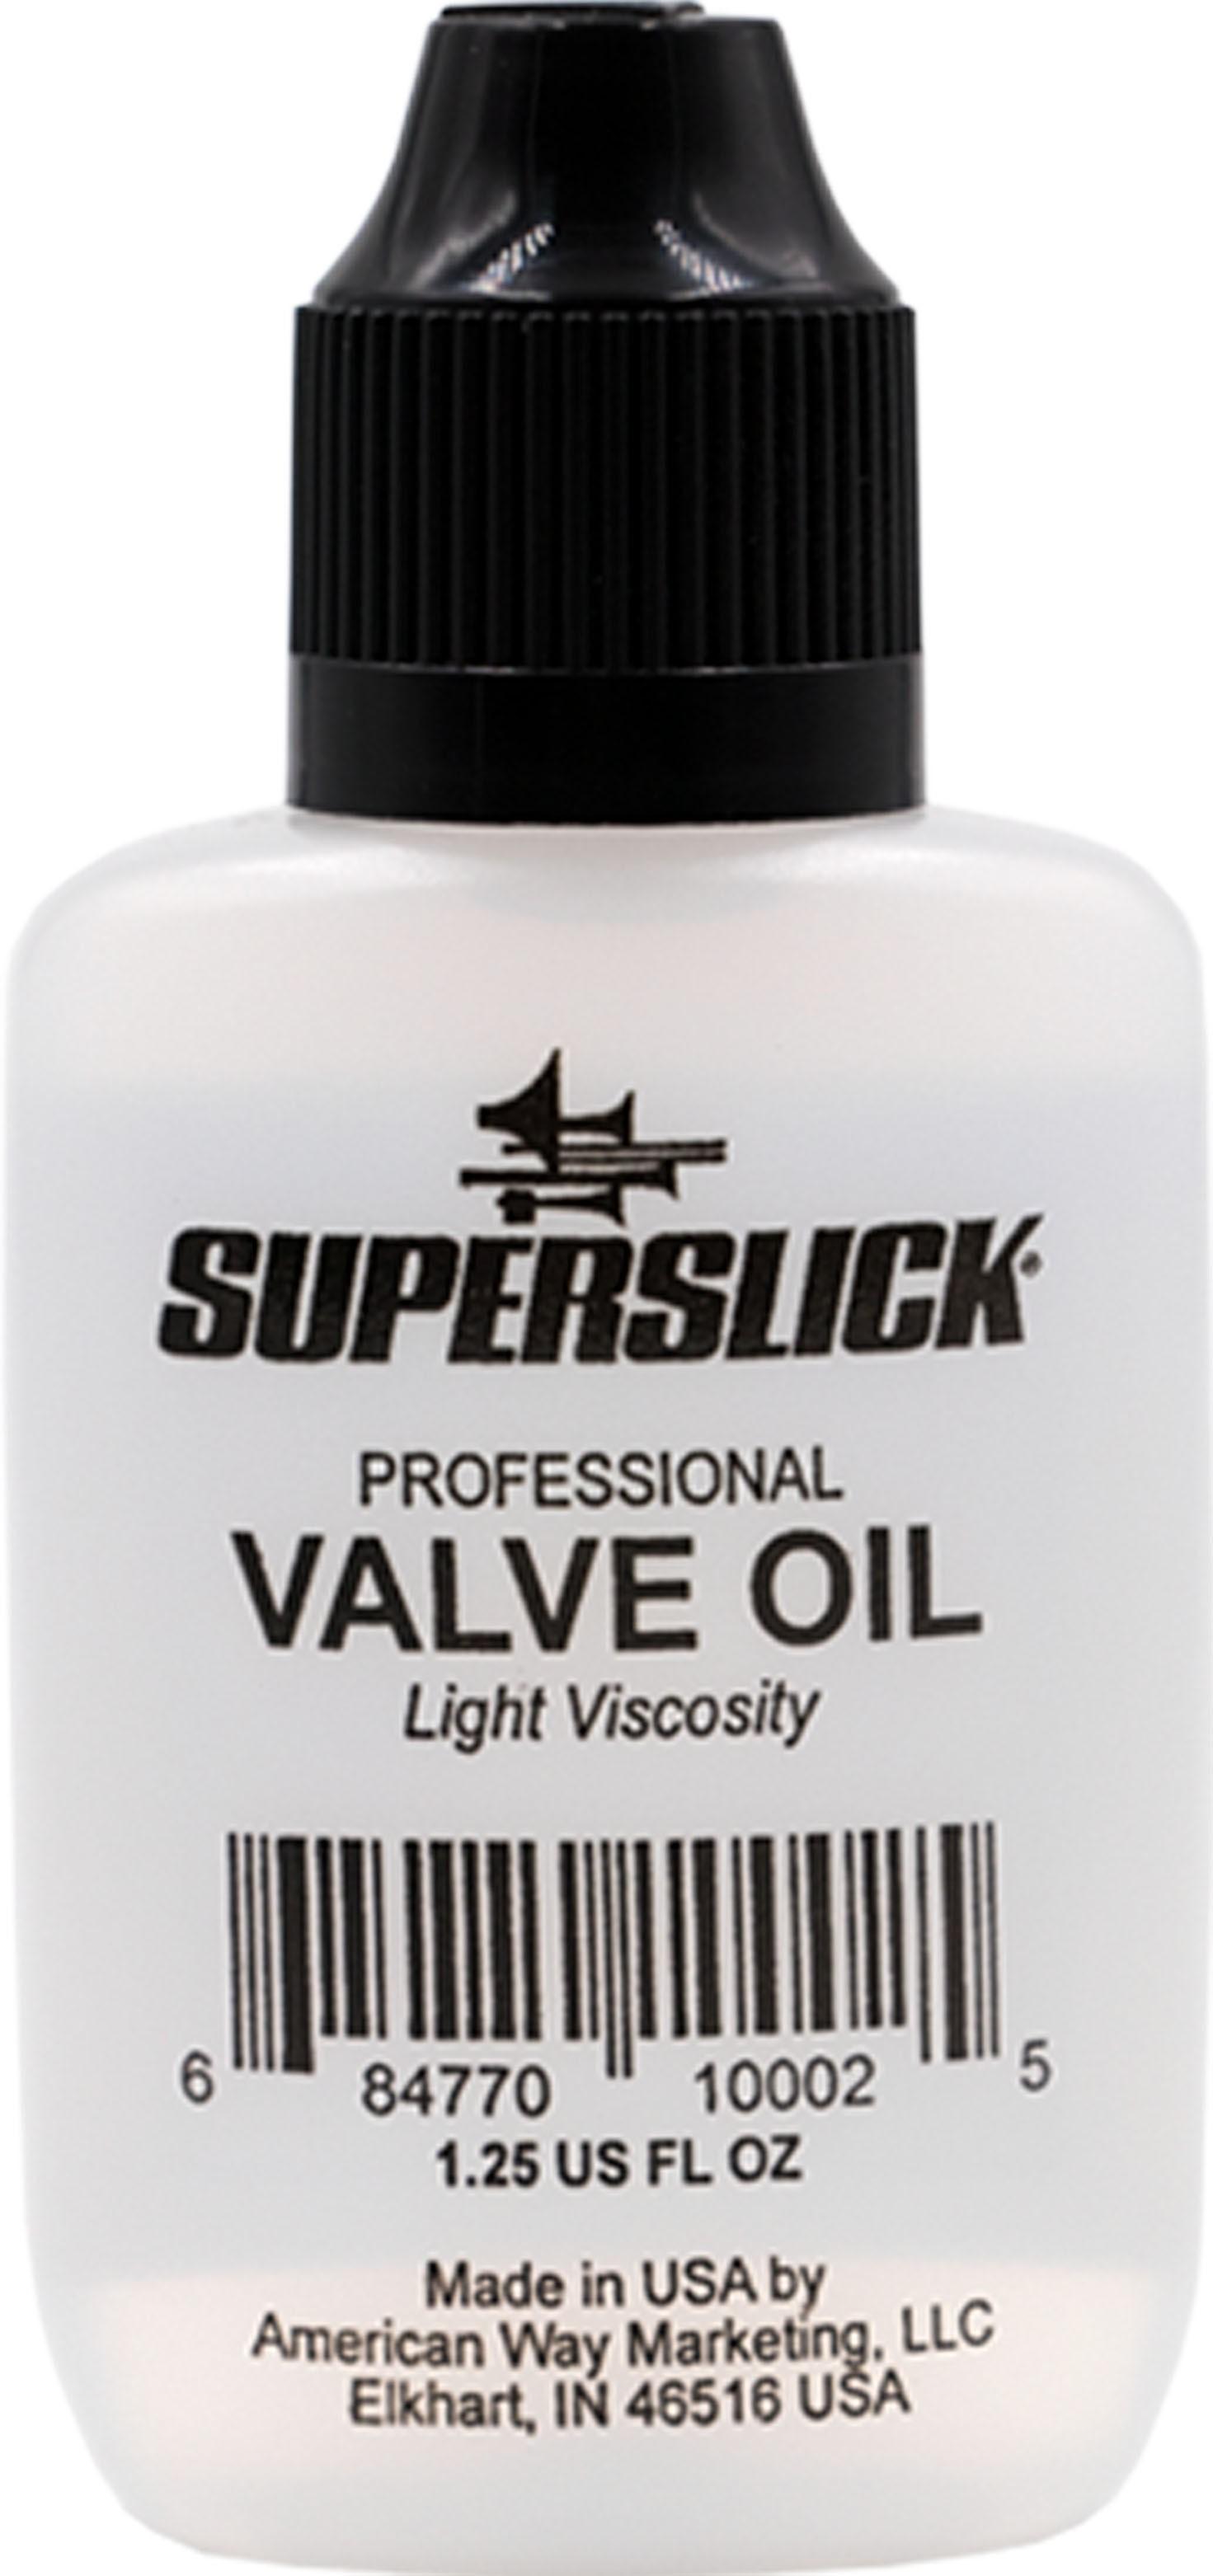 SuperSlick Valve Oil - 1.25oz